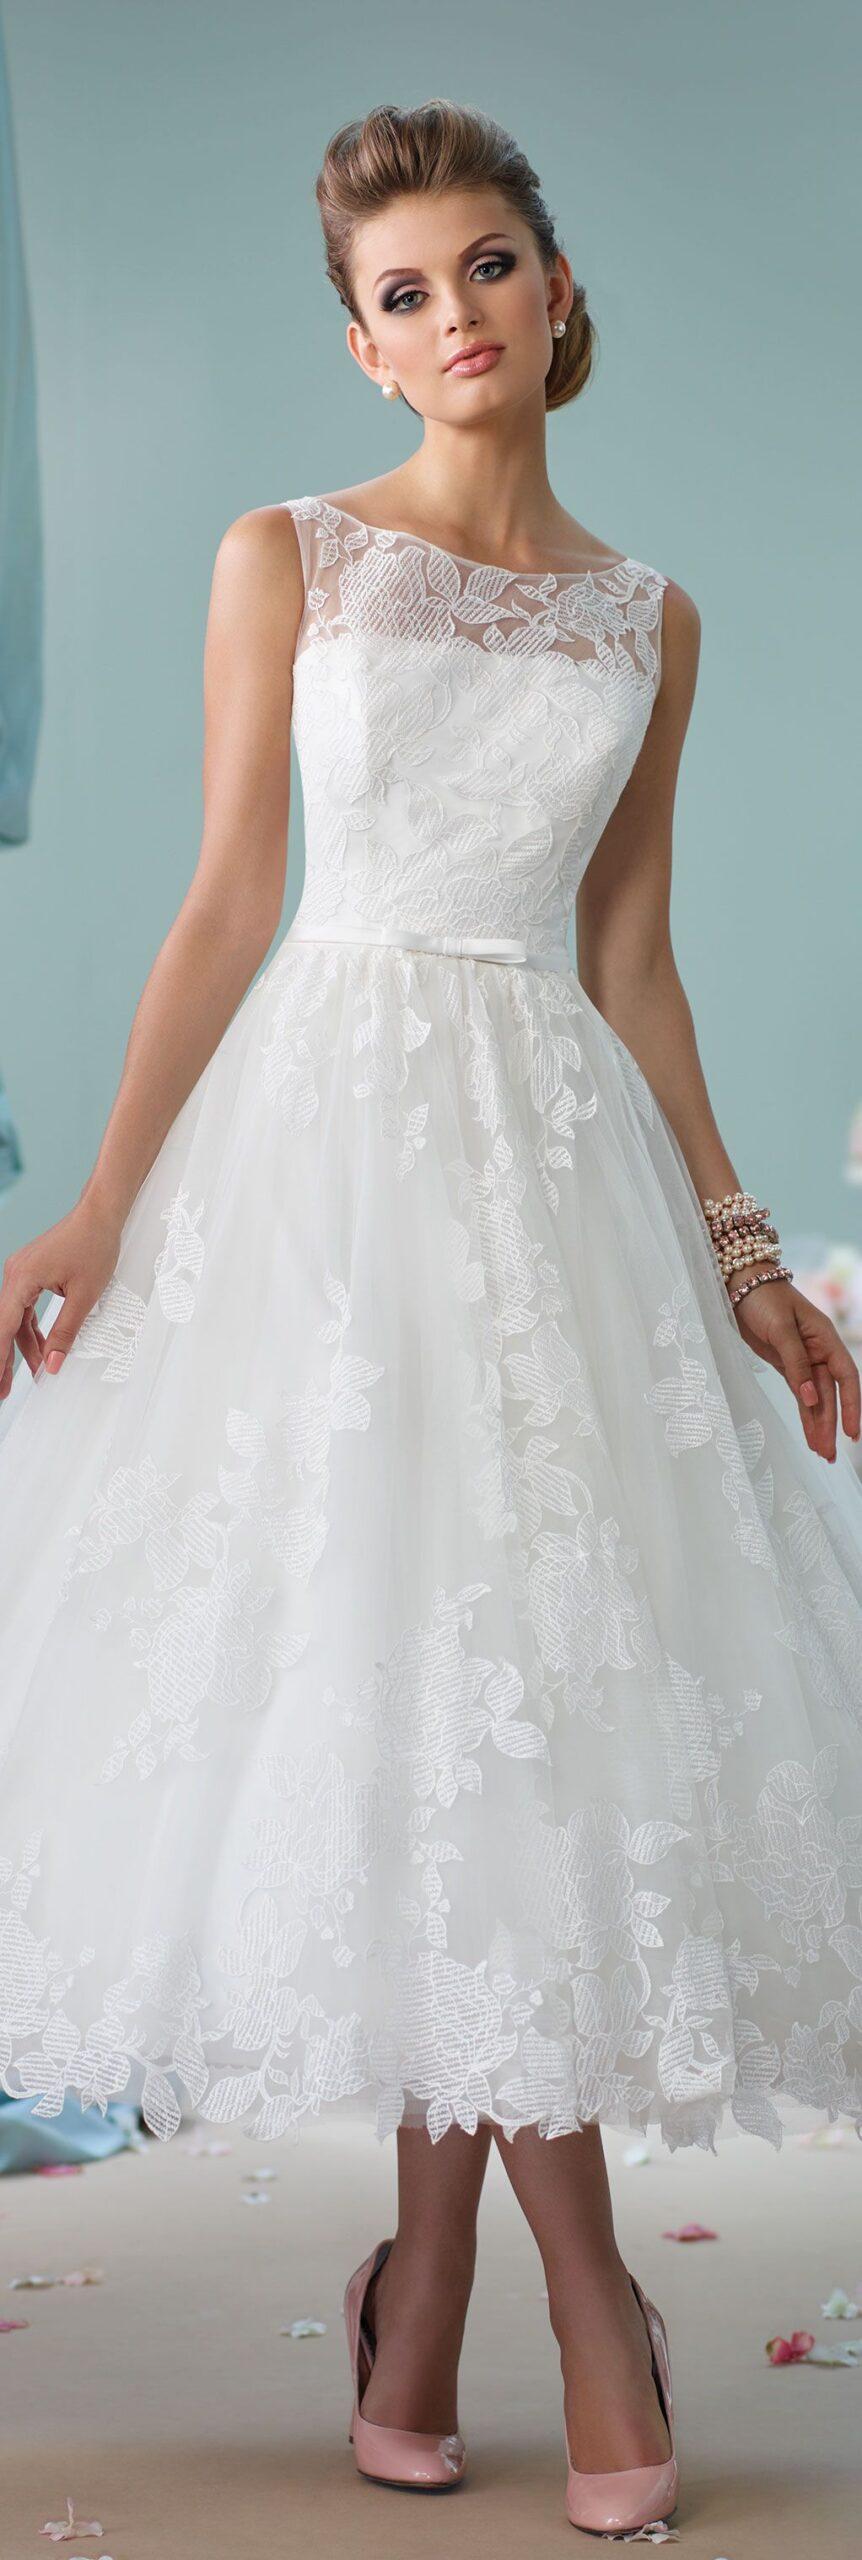 Wedding-Dresses-0430